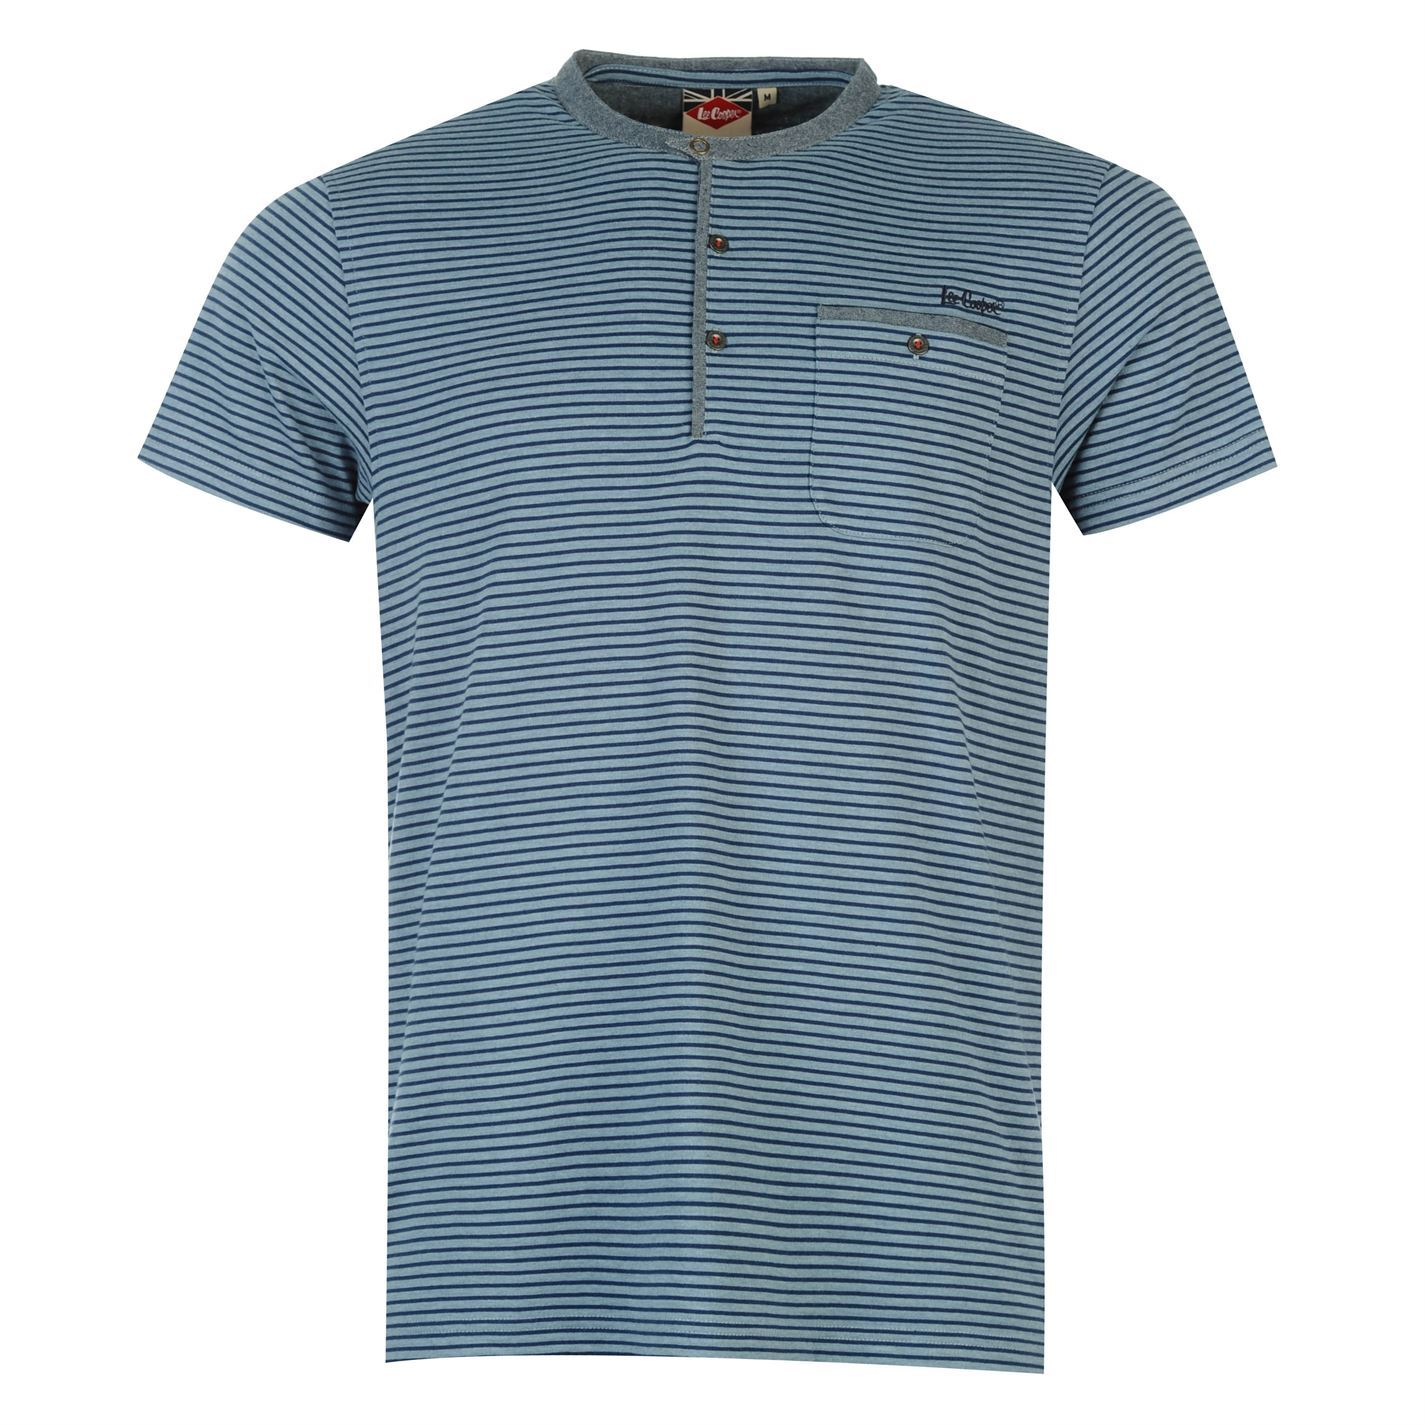 Lee cooper mens champion short sleeve striped granddad t for Best striped t shirt